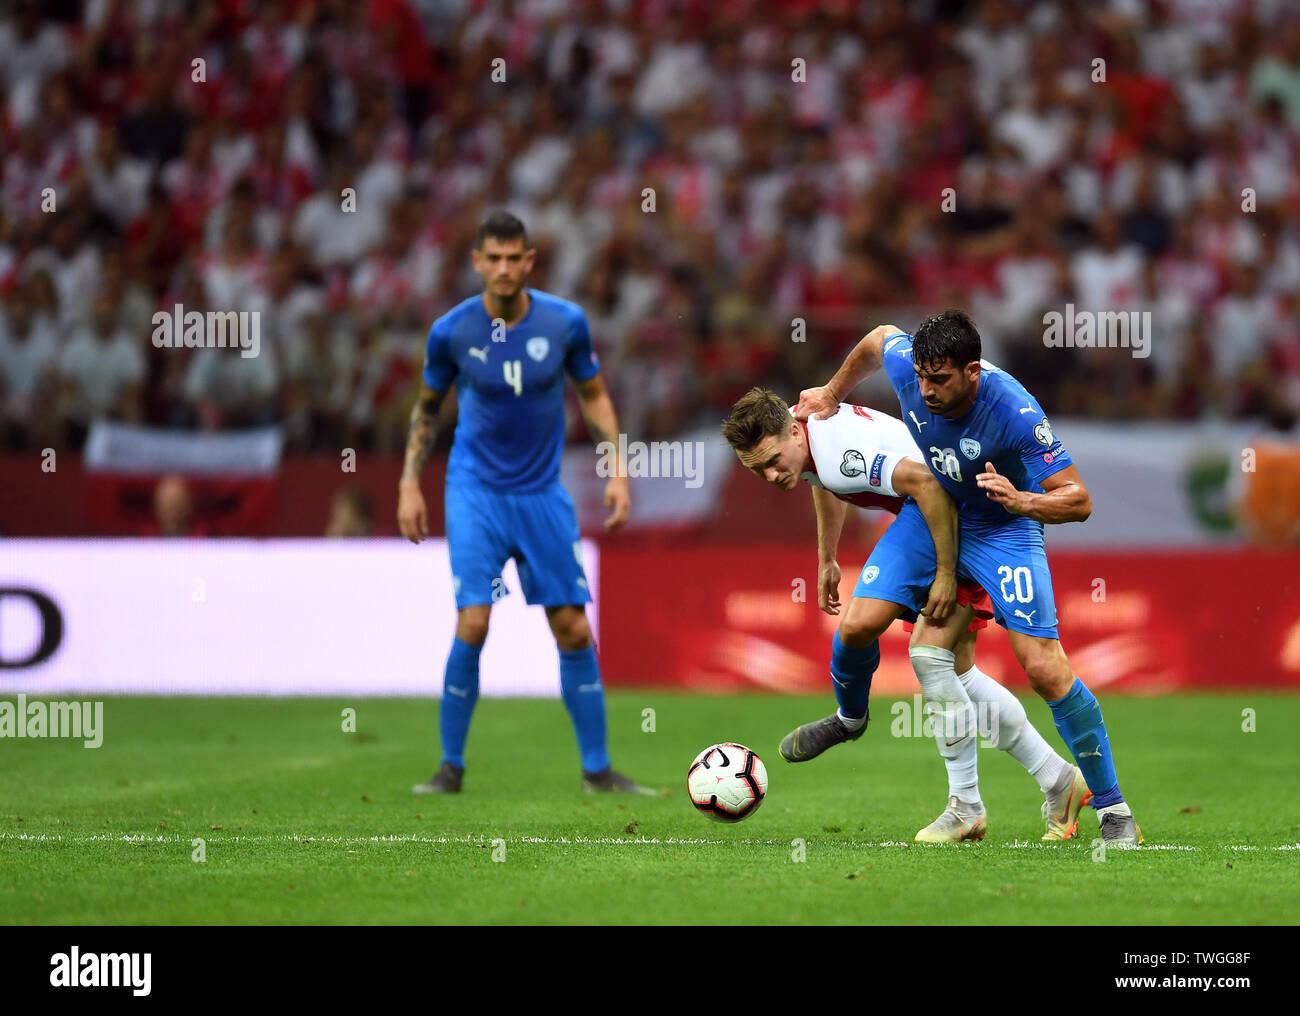 Warsaw, Poland, June 10, 2019: EURO 2020 qualifing round, group stage, Poland wins 4:0 with Izarel on PGE Narodowy. Piotr Zielinski (Poland)  Omri Ben Harush (Izrael) - Stock Image